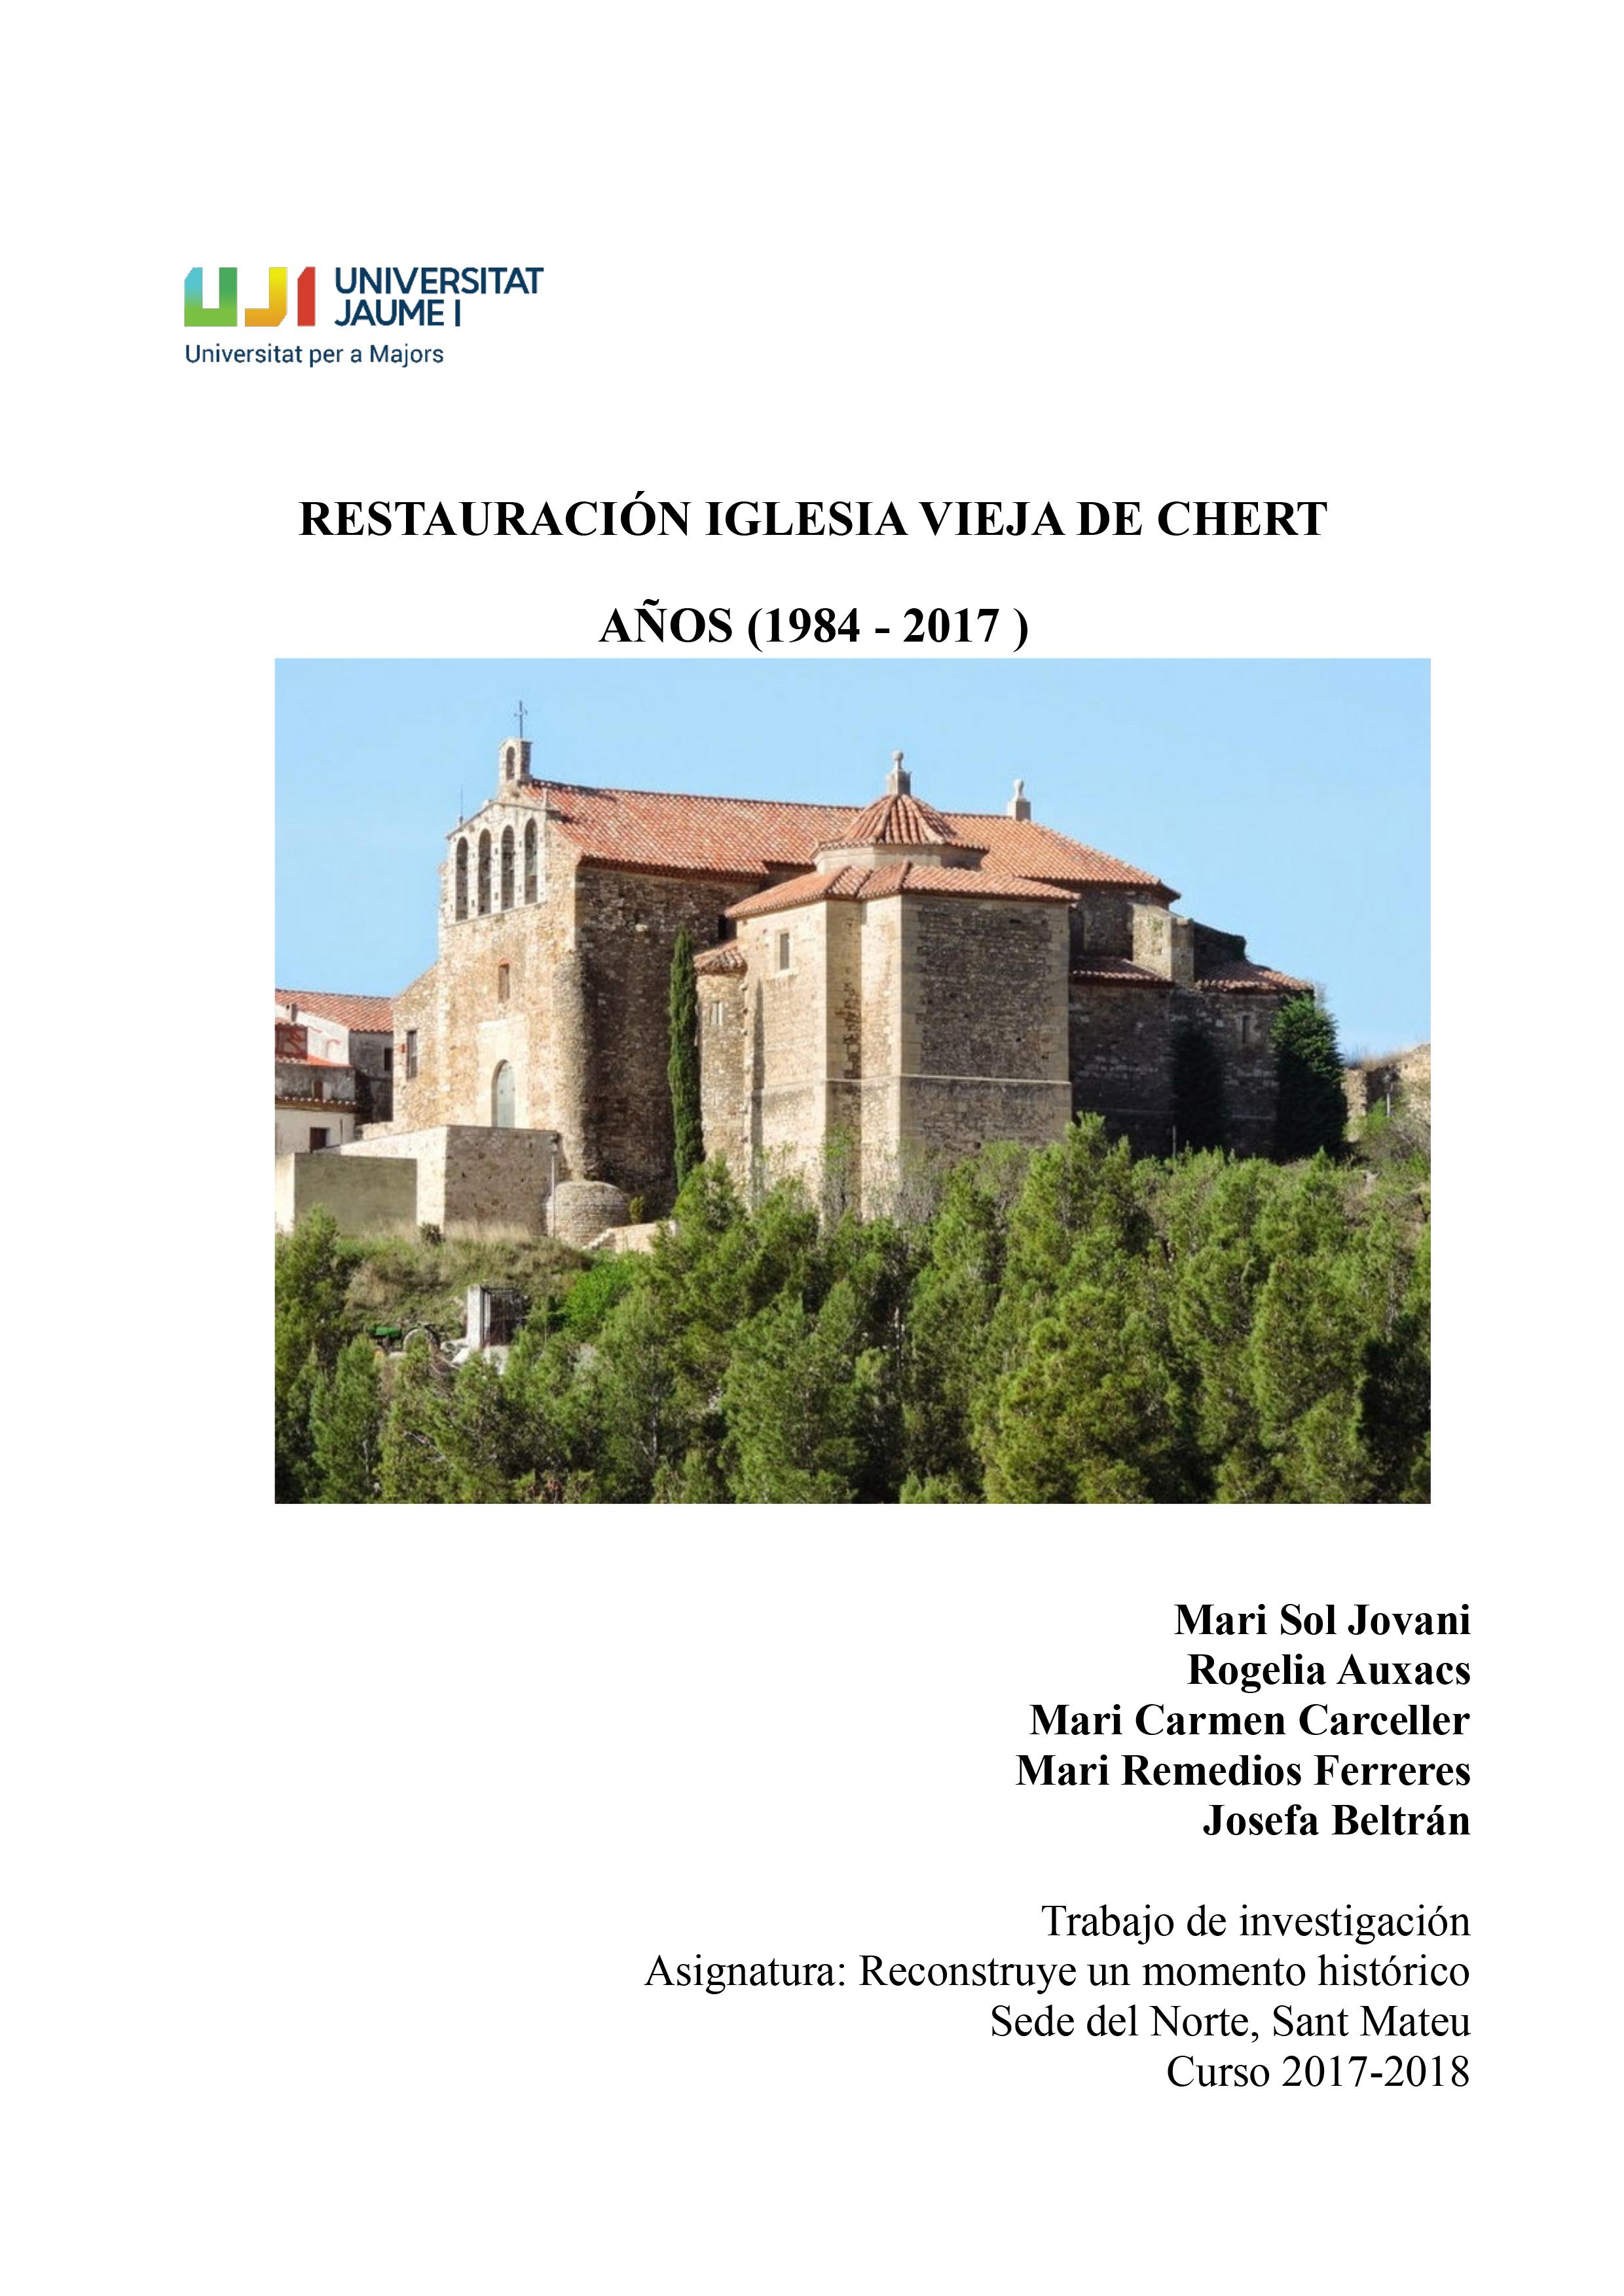 Restauración-de-la-Iglesia-Vieja-de-Chert